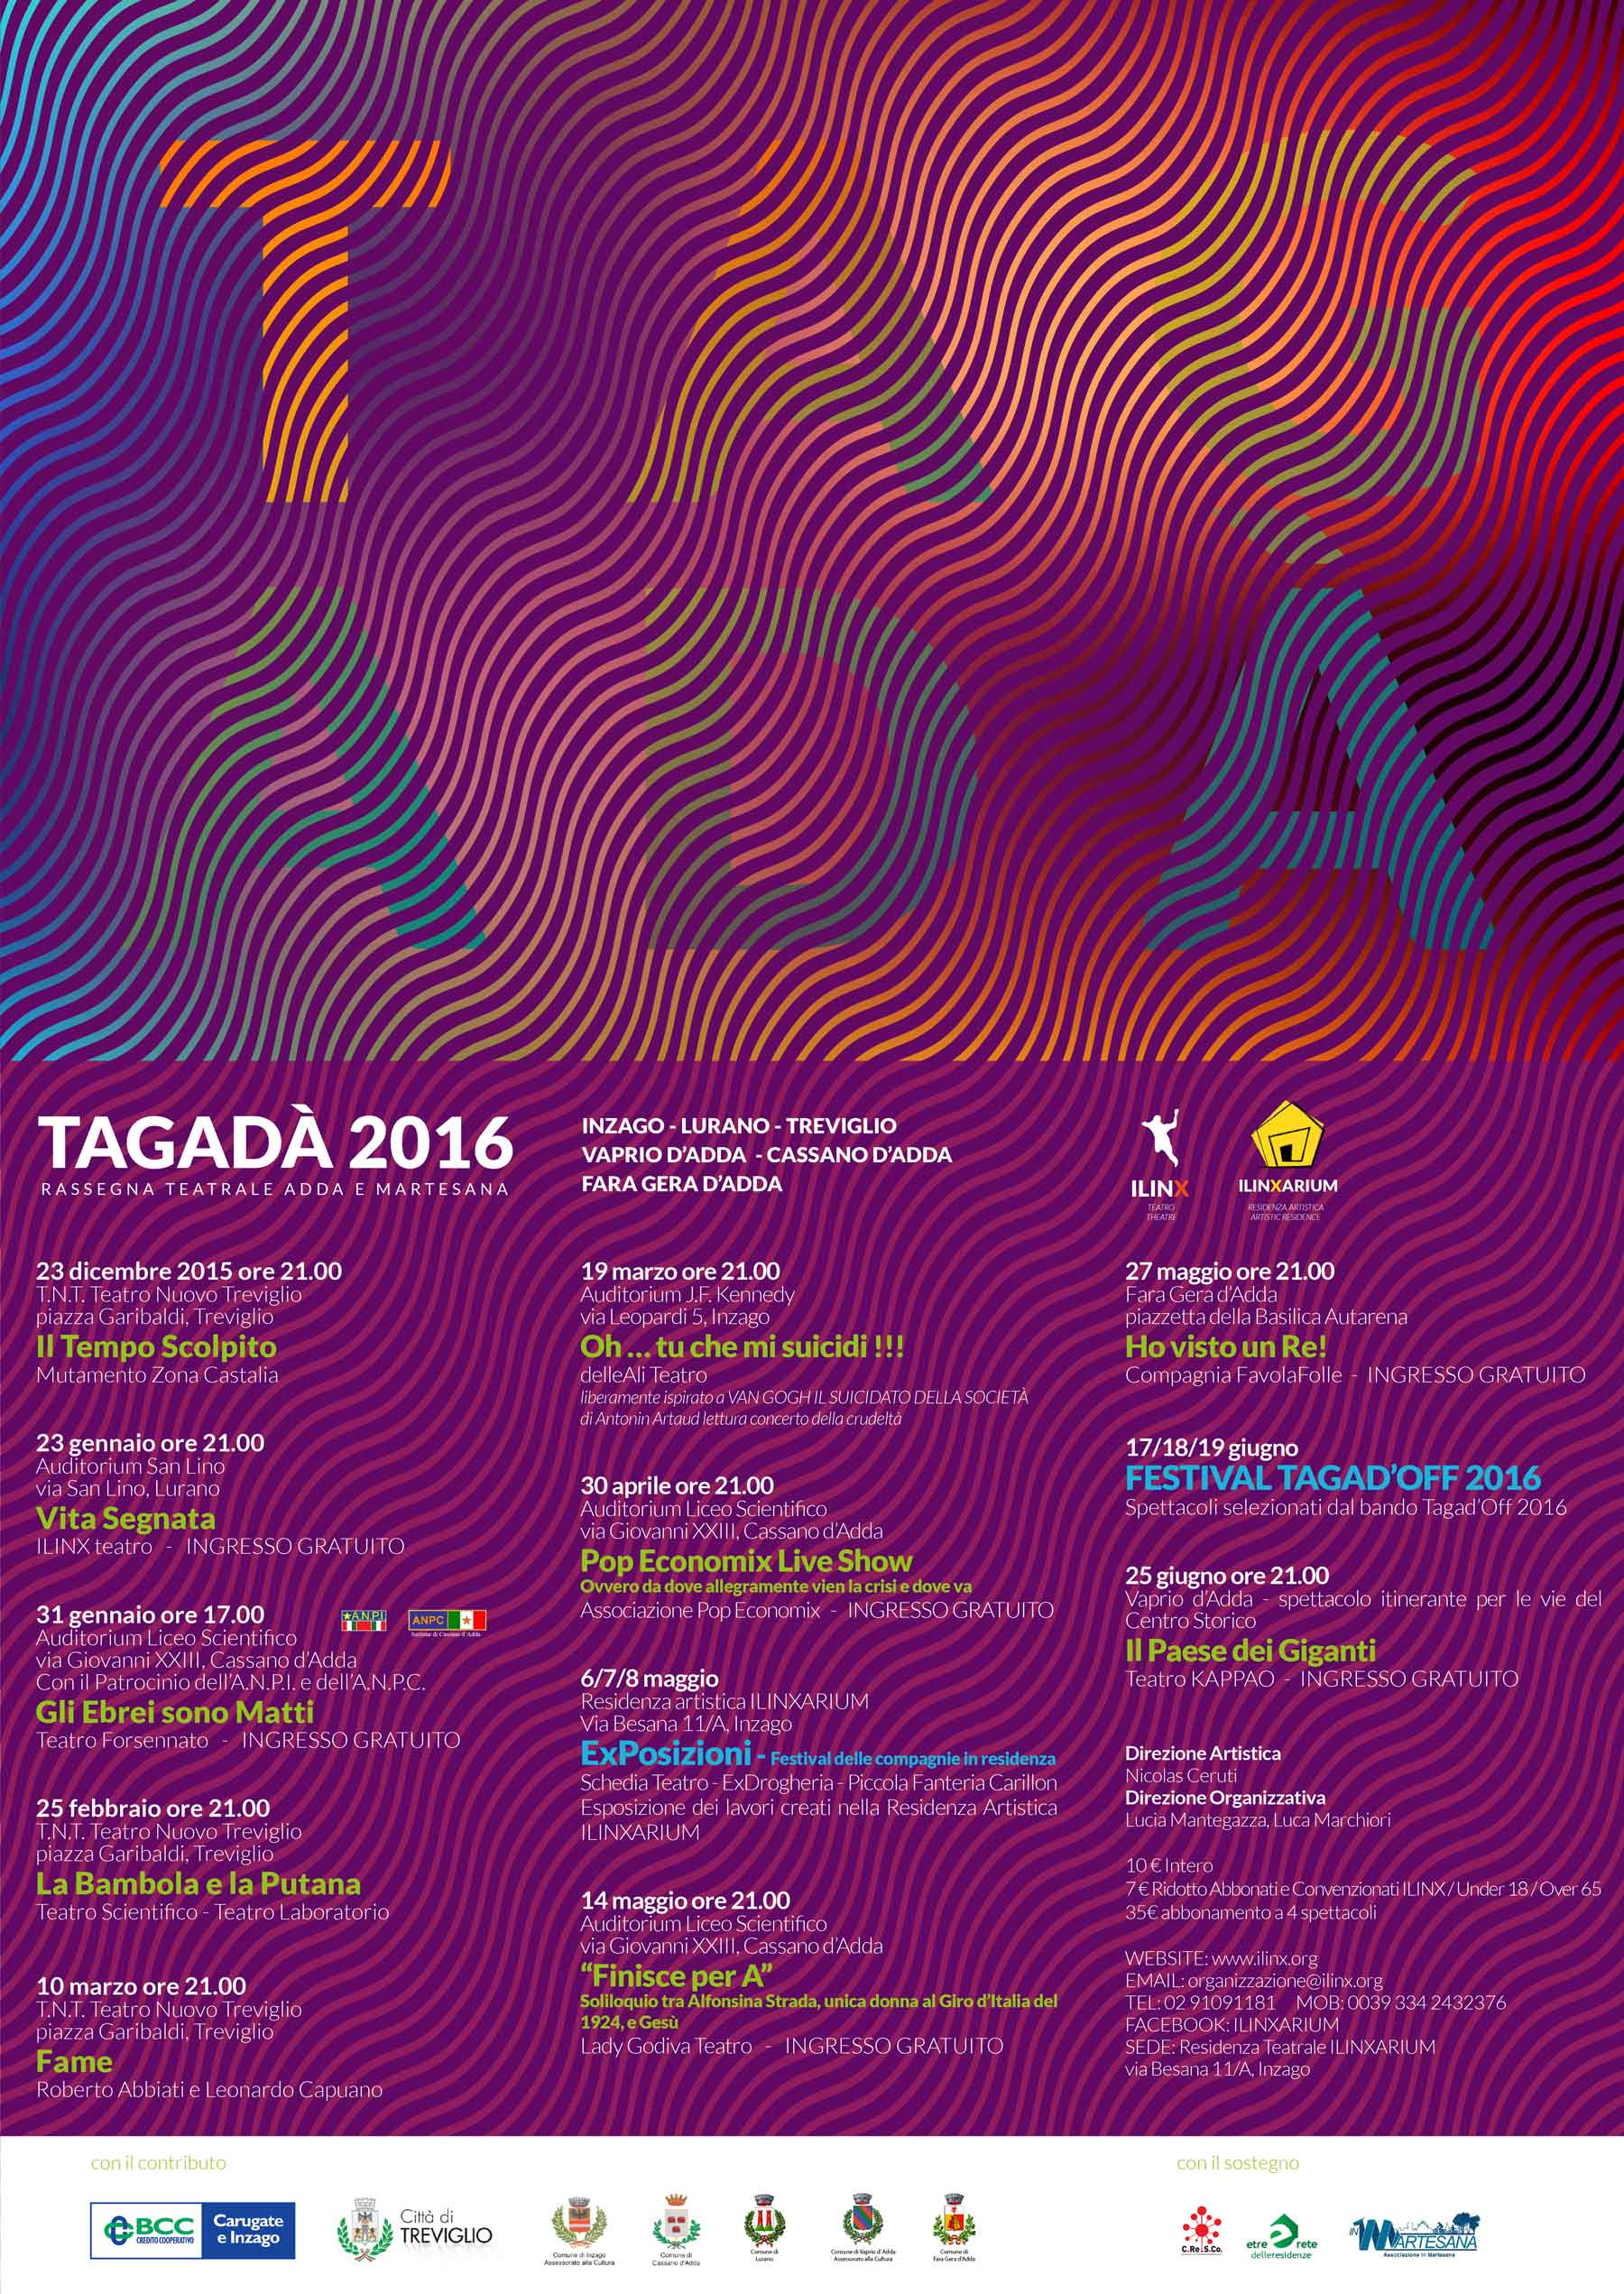 tagada_2016